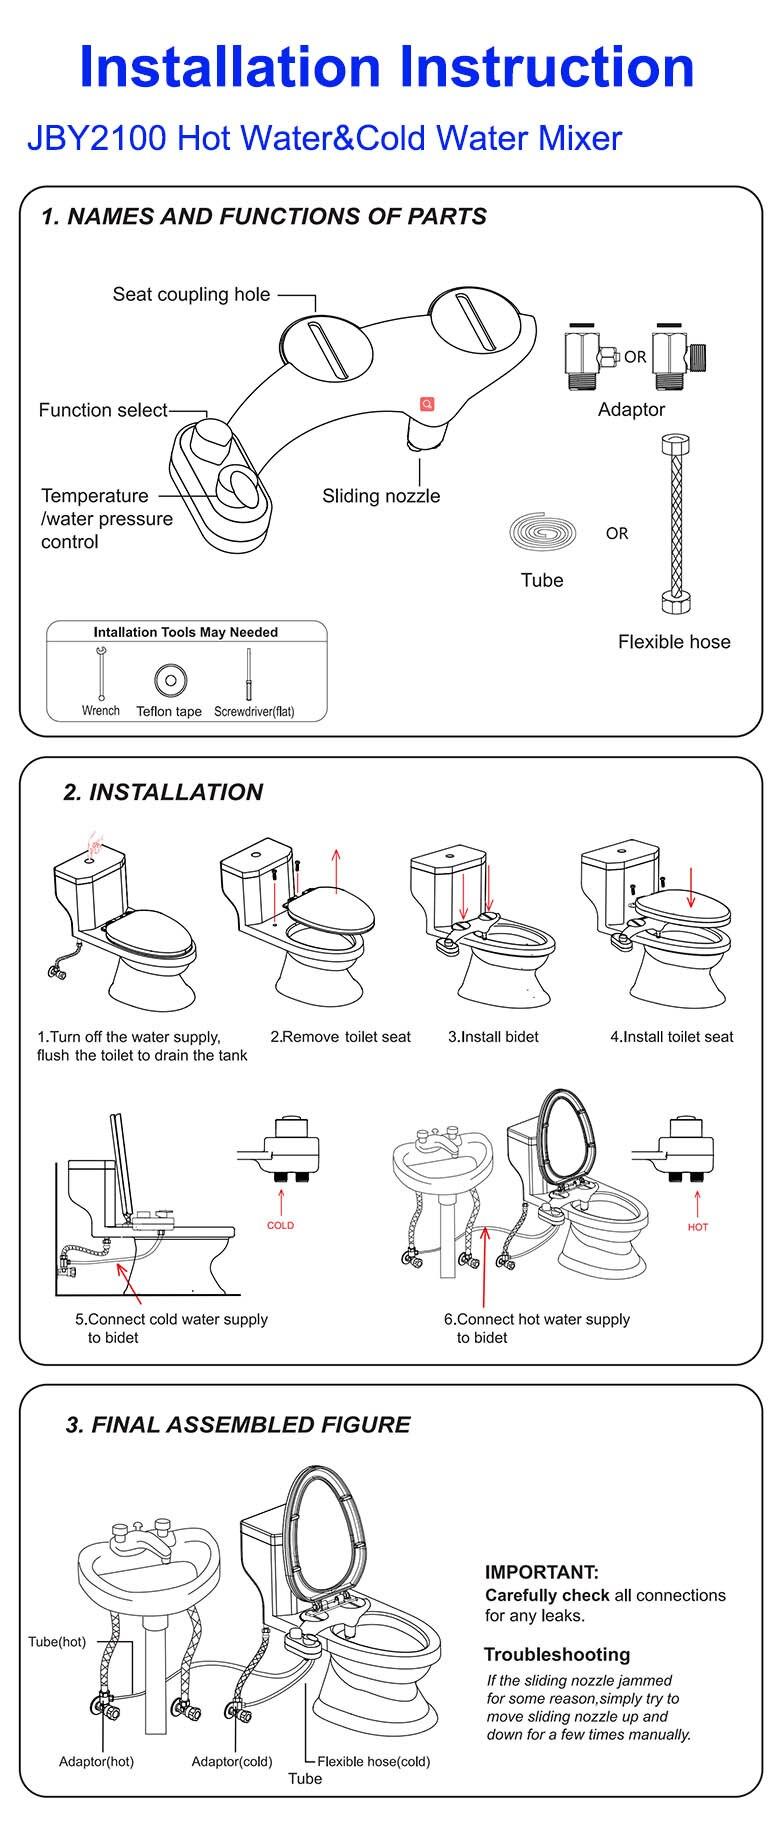 bidet bidet toilet bidet toilet seat bidet attachment portable bidet toilet bidet bidet sprayer bidet toilet attachment best bidet toilet seat best bidet attachment toilet seat bidet